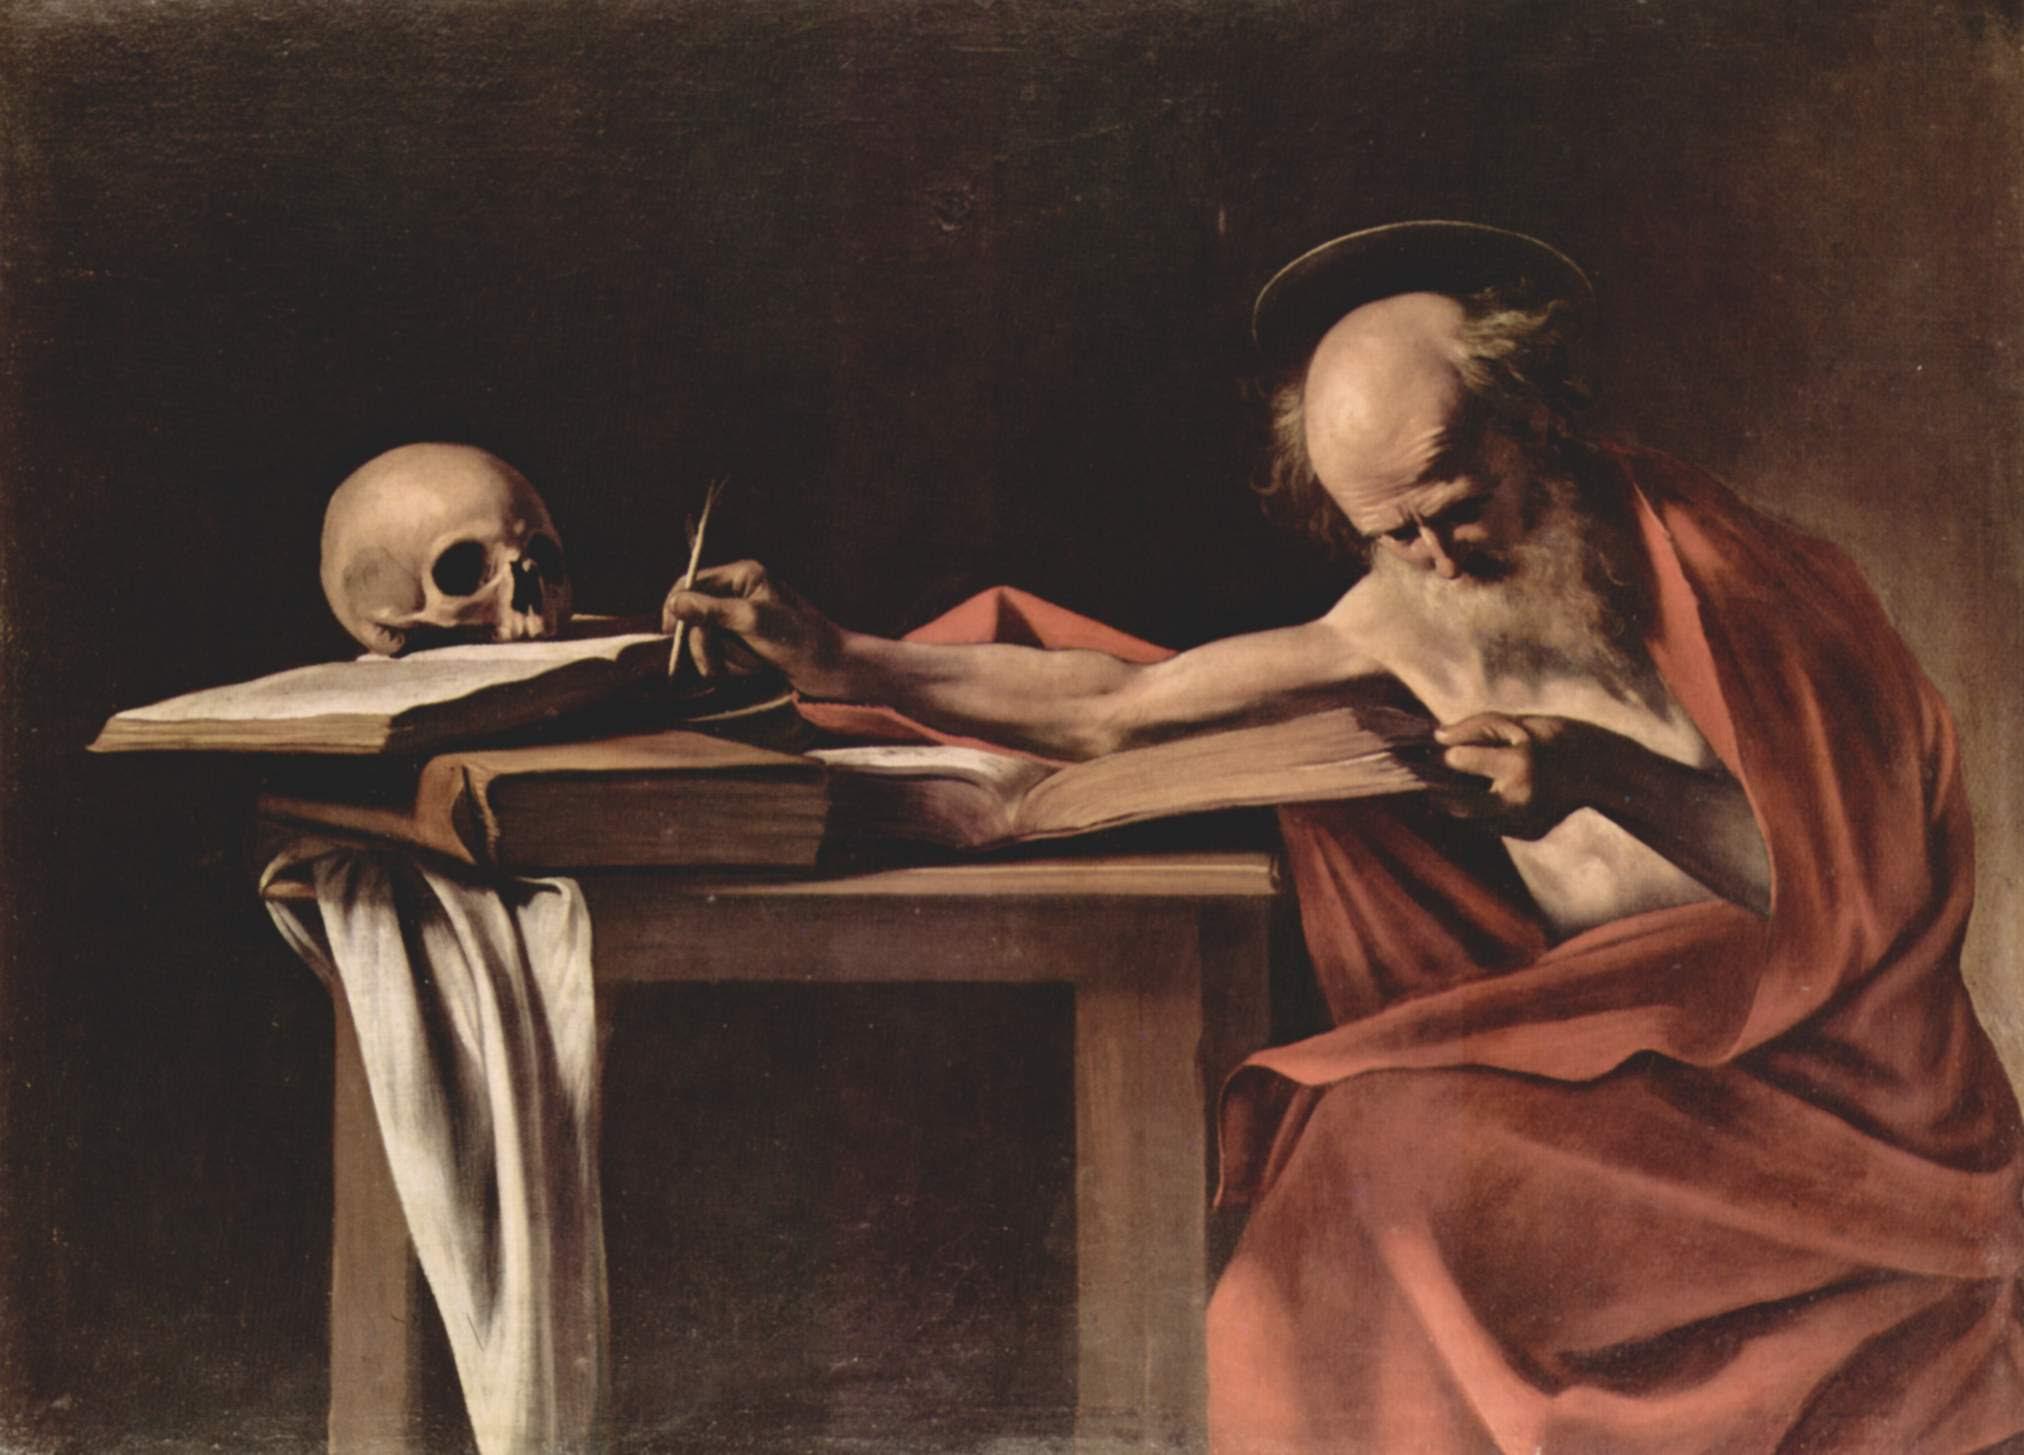 Plik:Michelangelo Caravaggio 057.jpg – Wikipedia, wolna encyklopedia